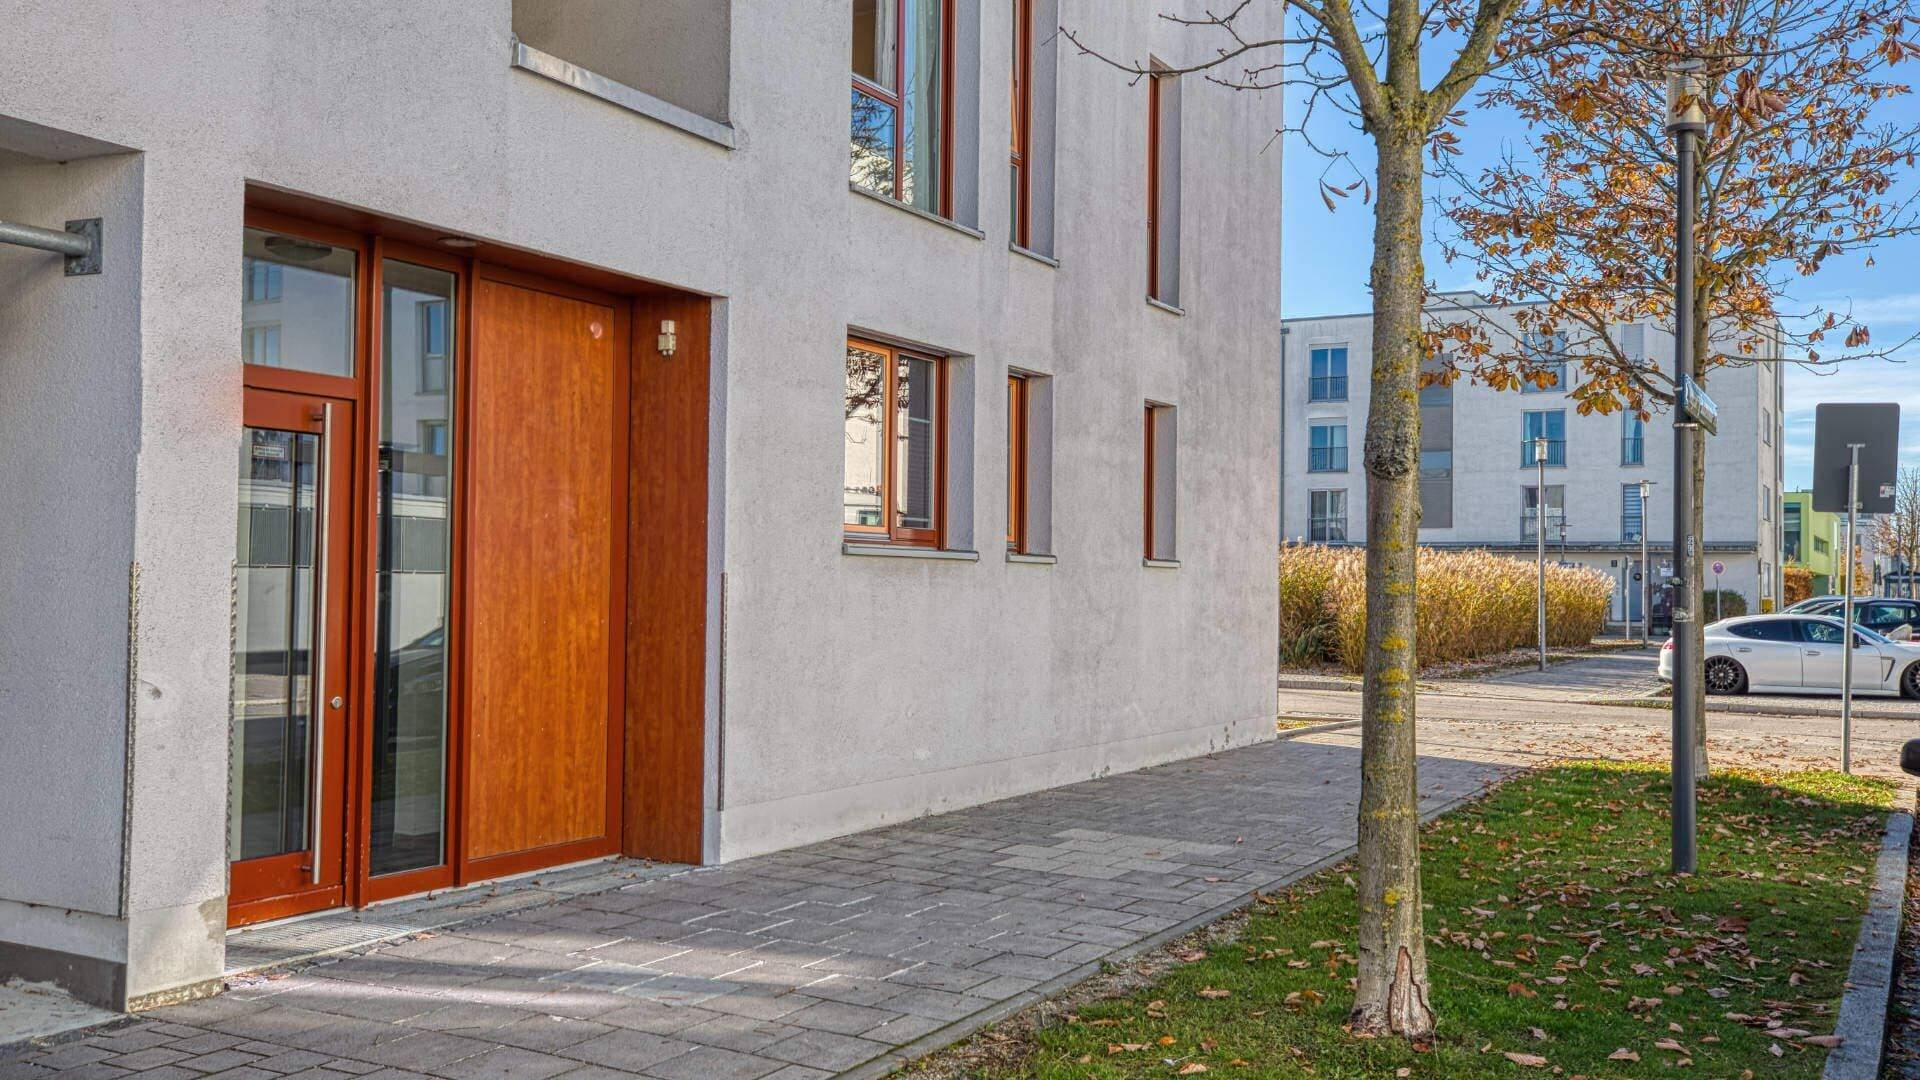 Riem Wohnung Eingang